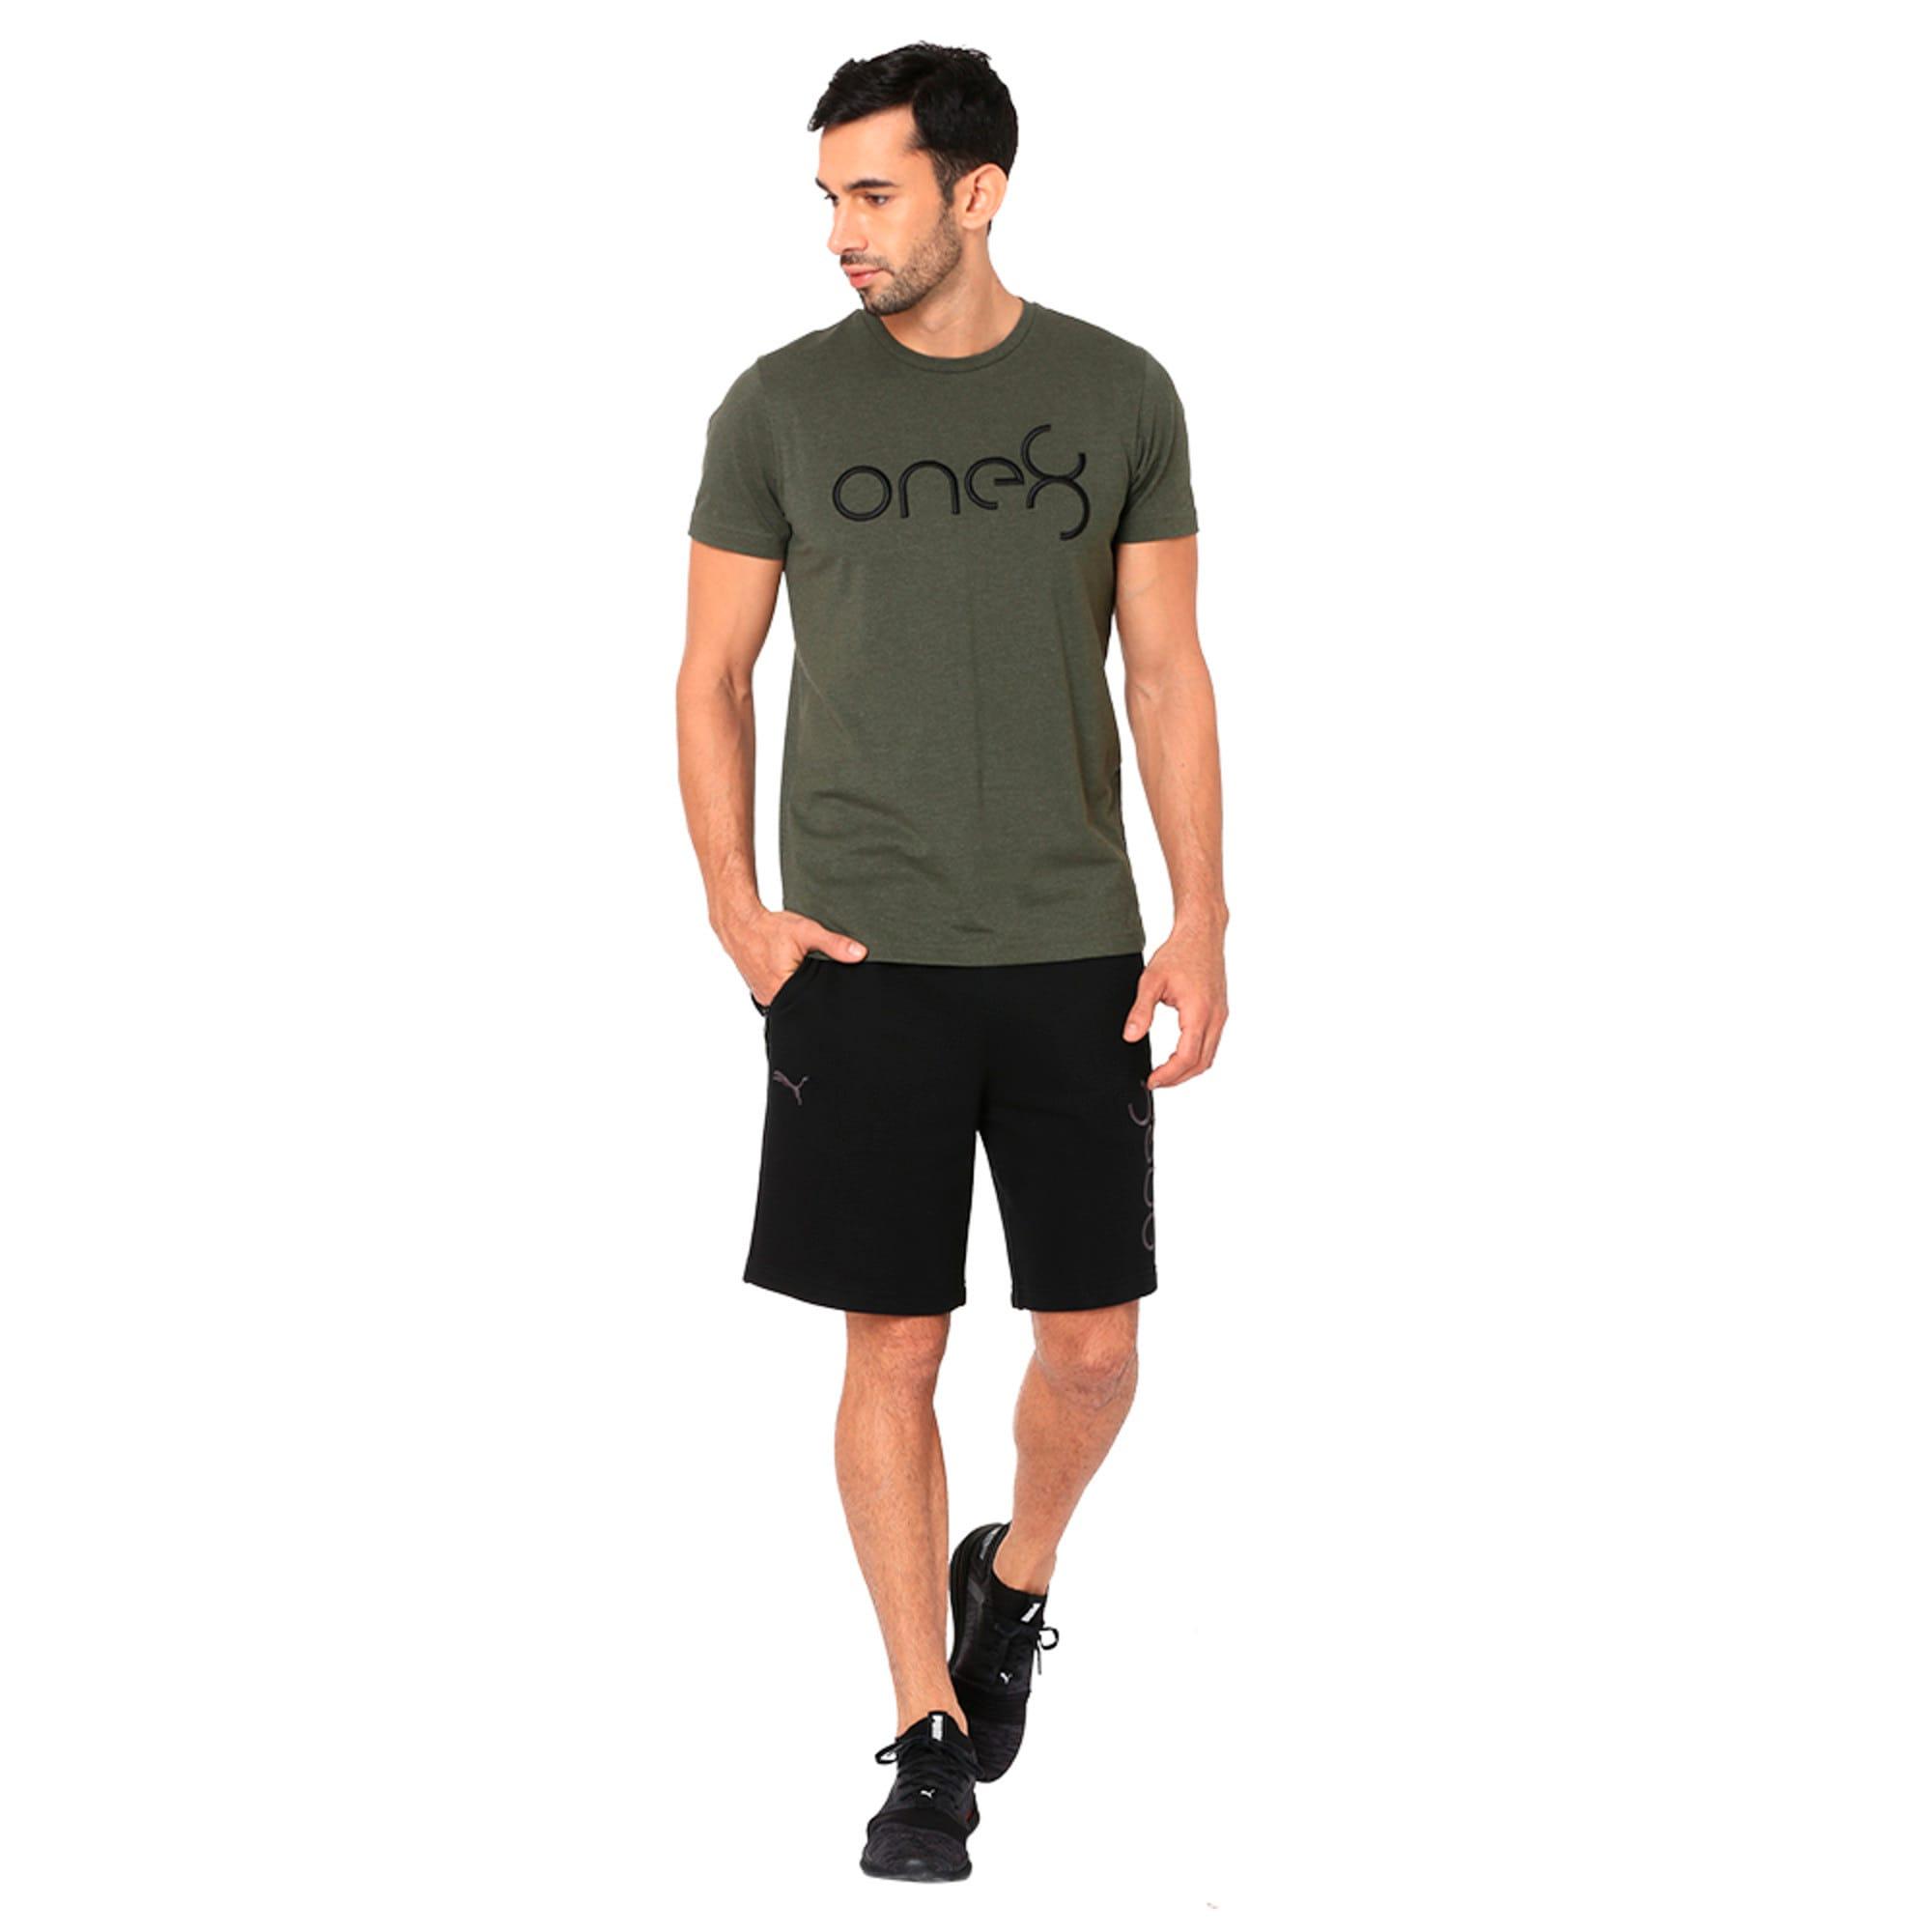 Thumbnail 3 of One8 VK Men's Sweat Shorts, Puma Black, medium-IND